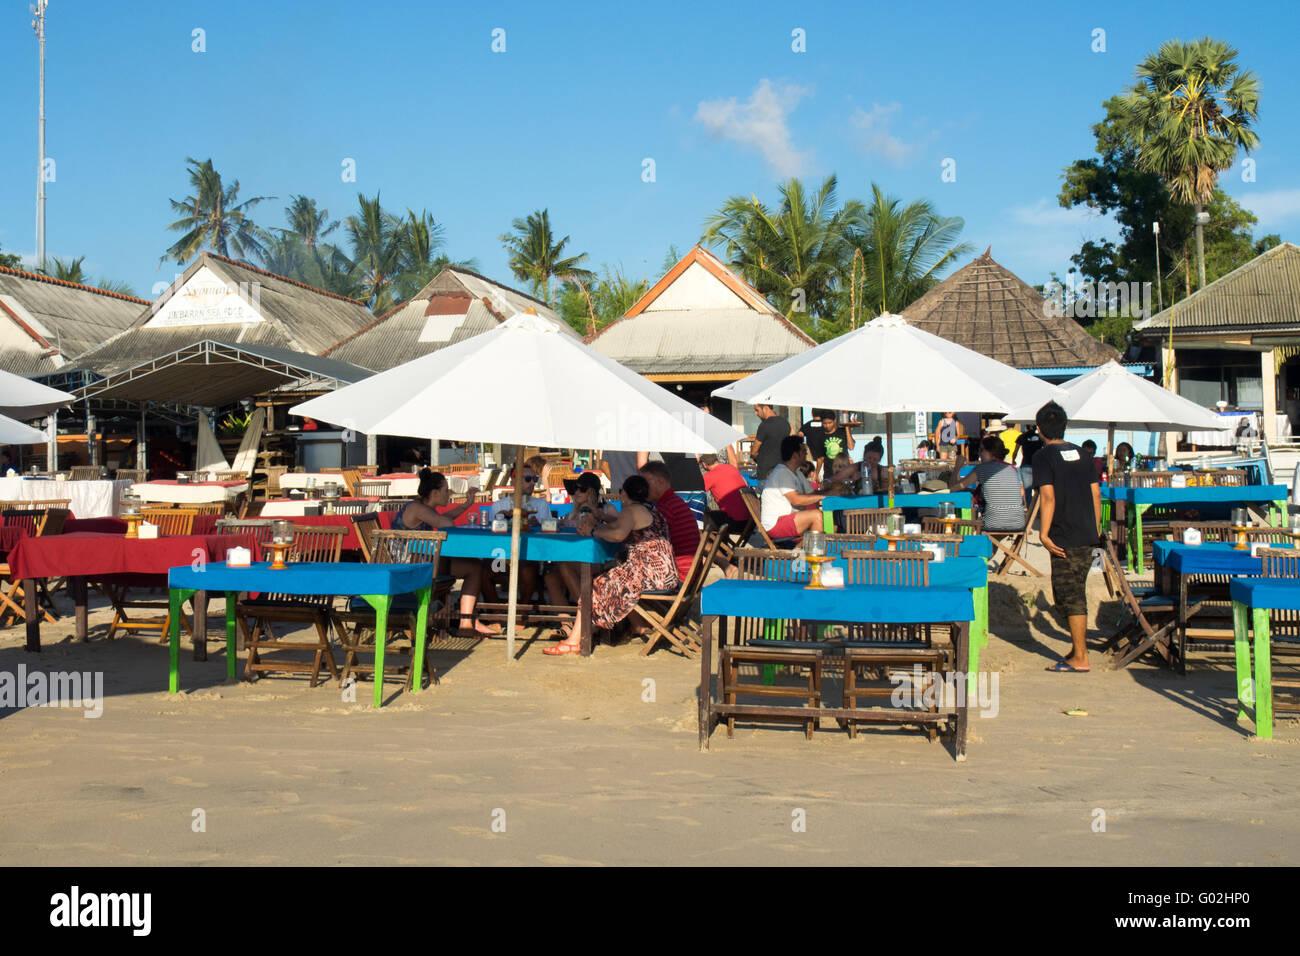 Alfresco dining on the beach at Jimbaran Bay, Bali. - Stock Image